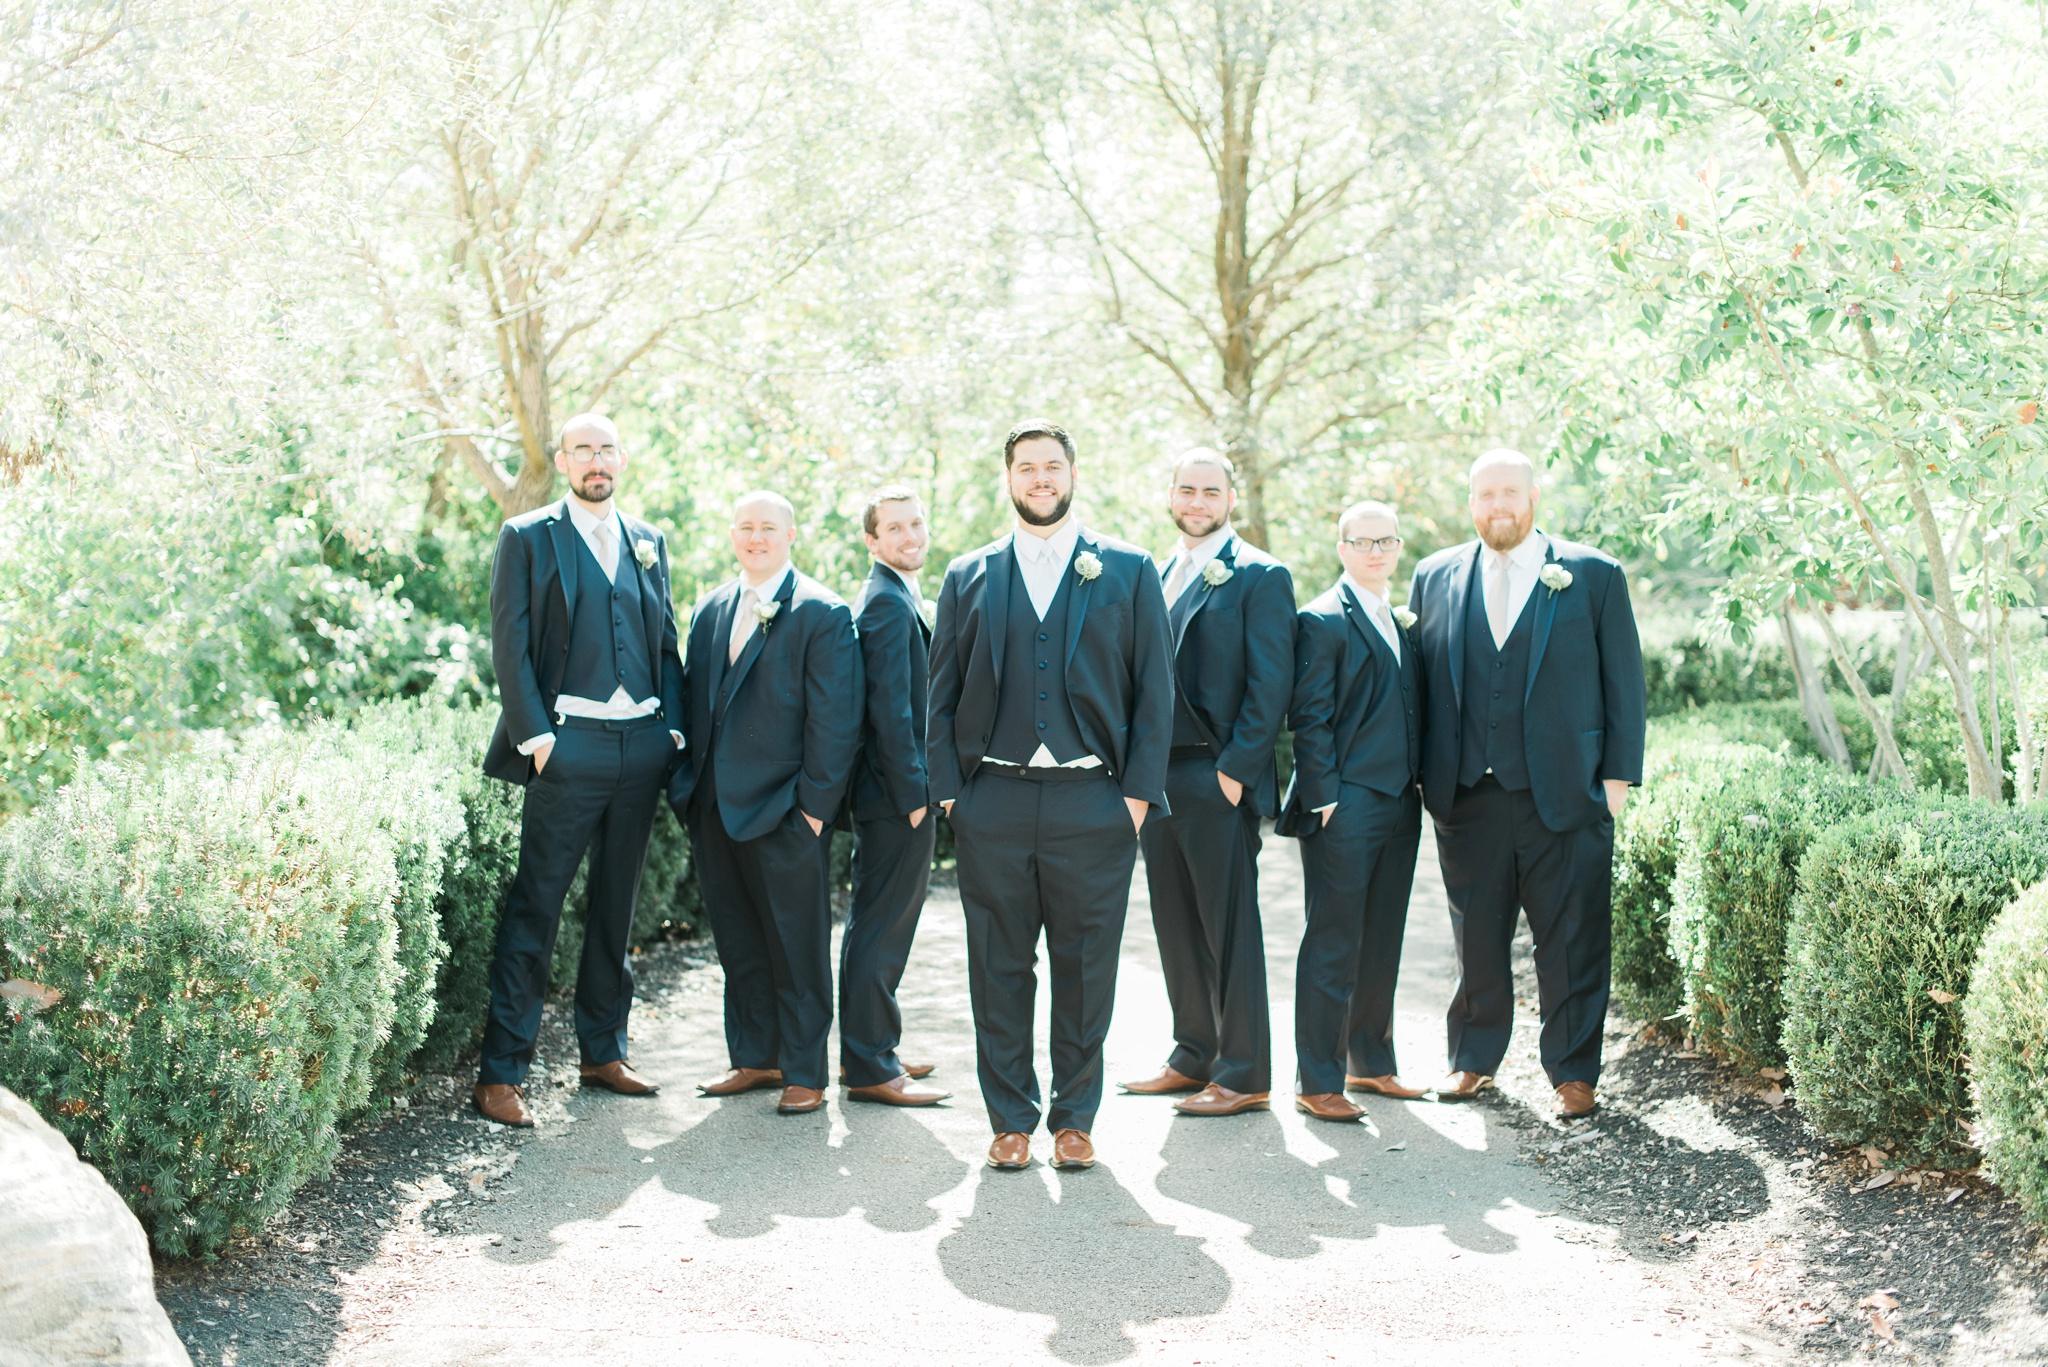 aladdin-shrine-center-wedding-grove-city-ohio-amber-jared_0079.jpg